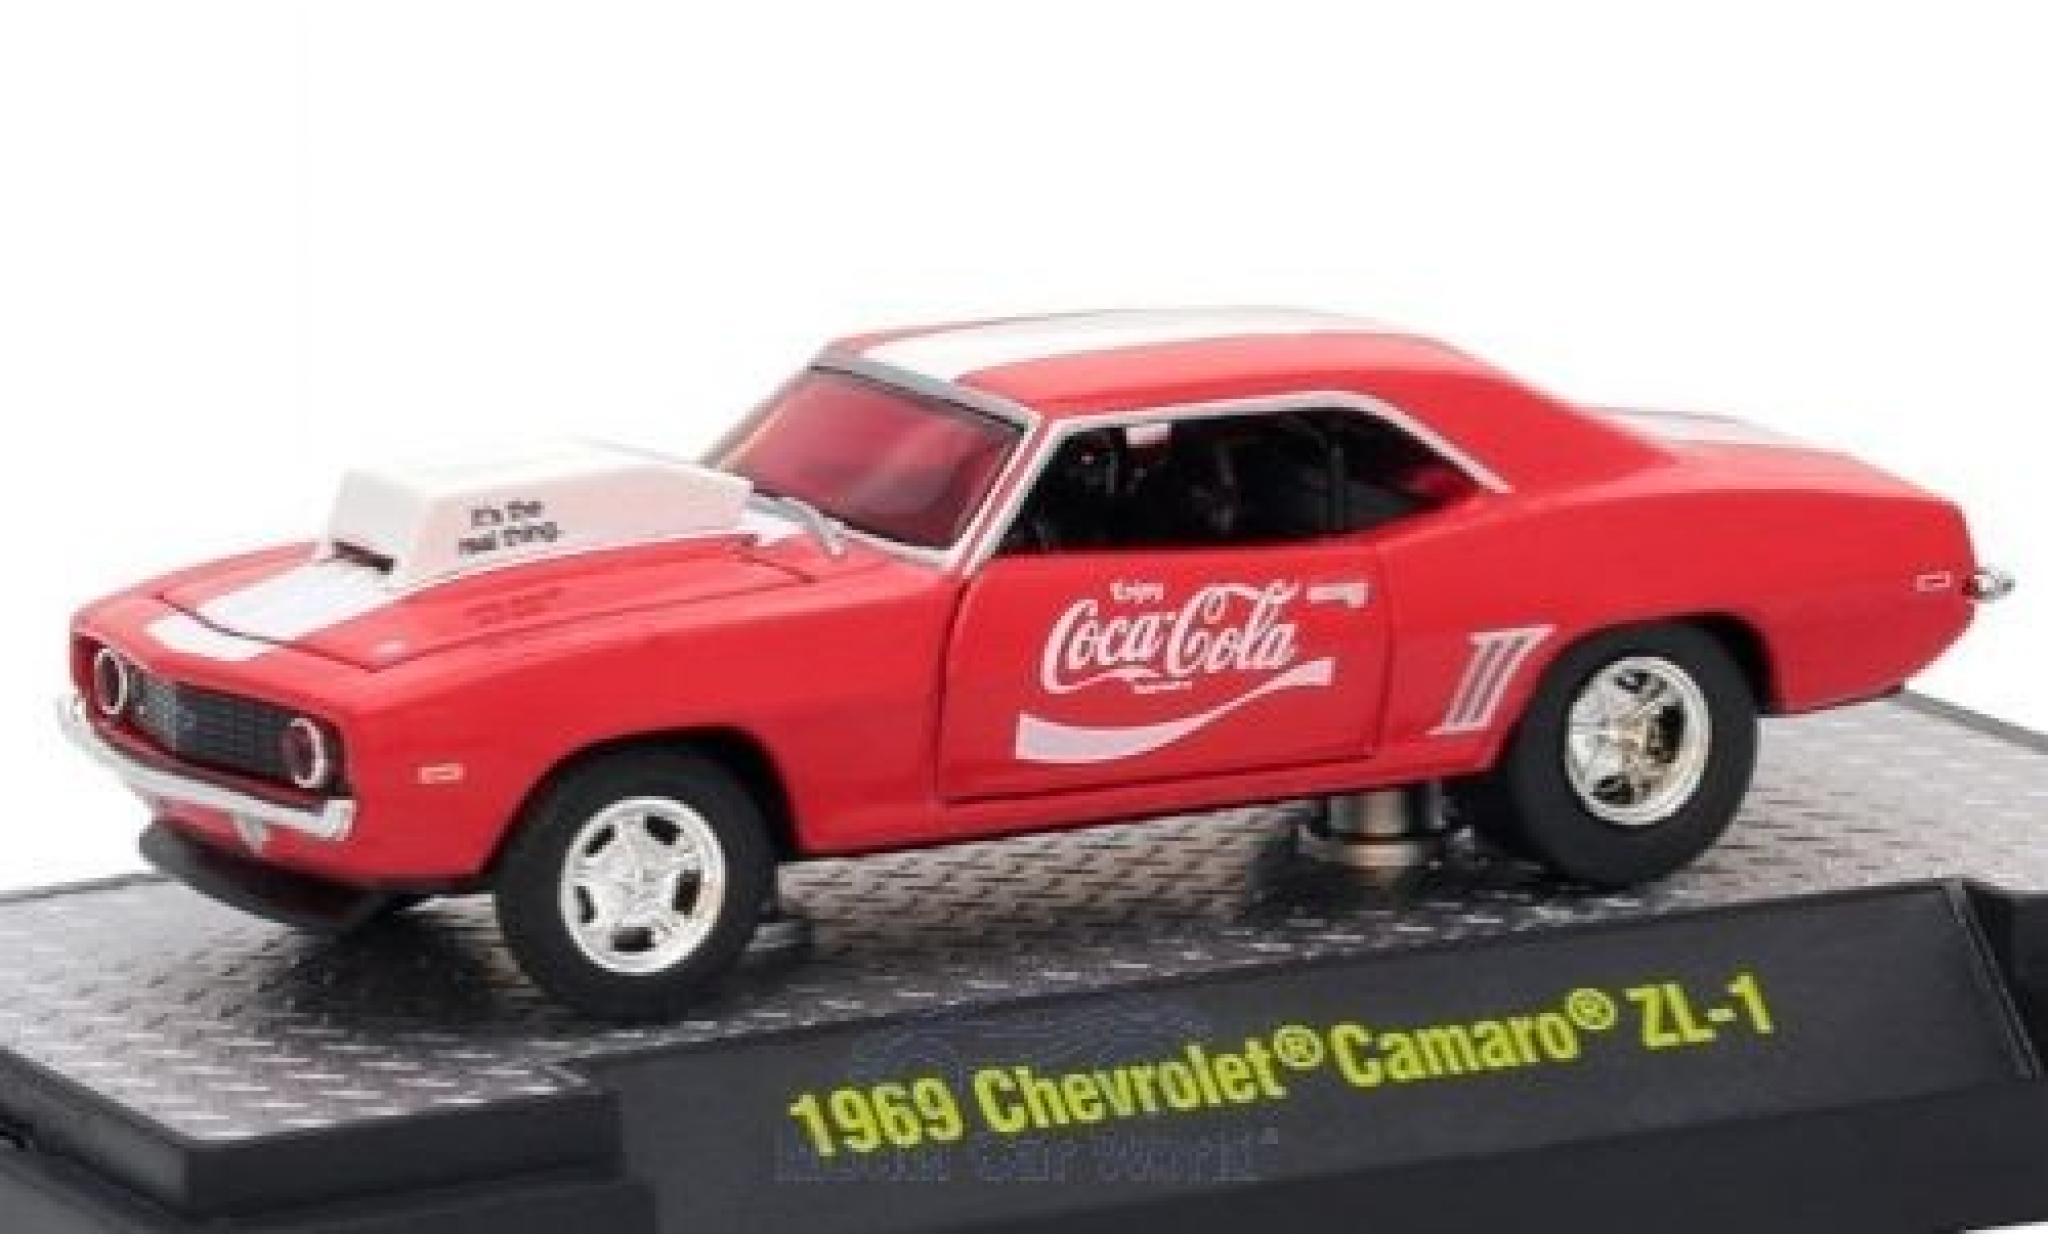 Chevrolet Camaro ZL1 1/64 M2 Machines rosso/bianco Coca Cola 1969